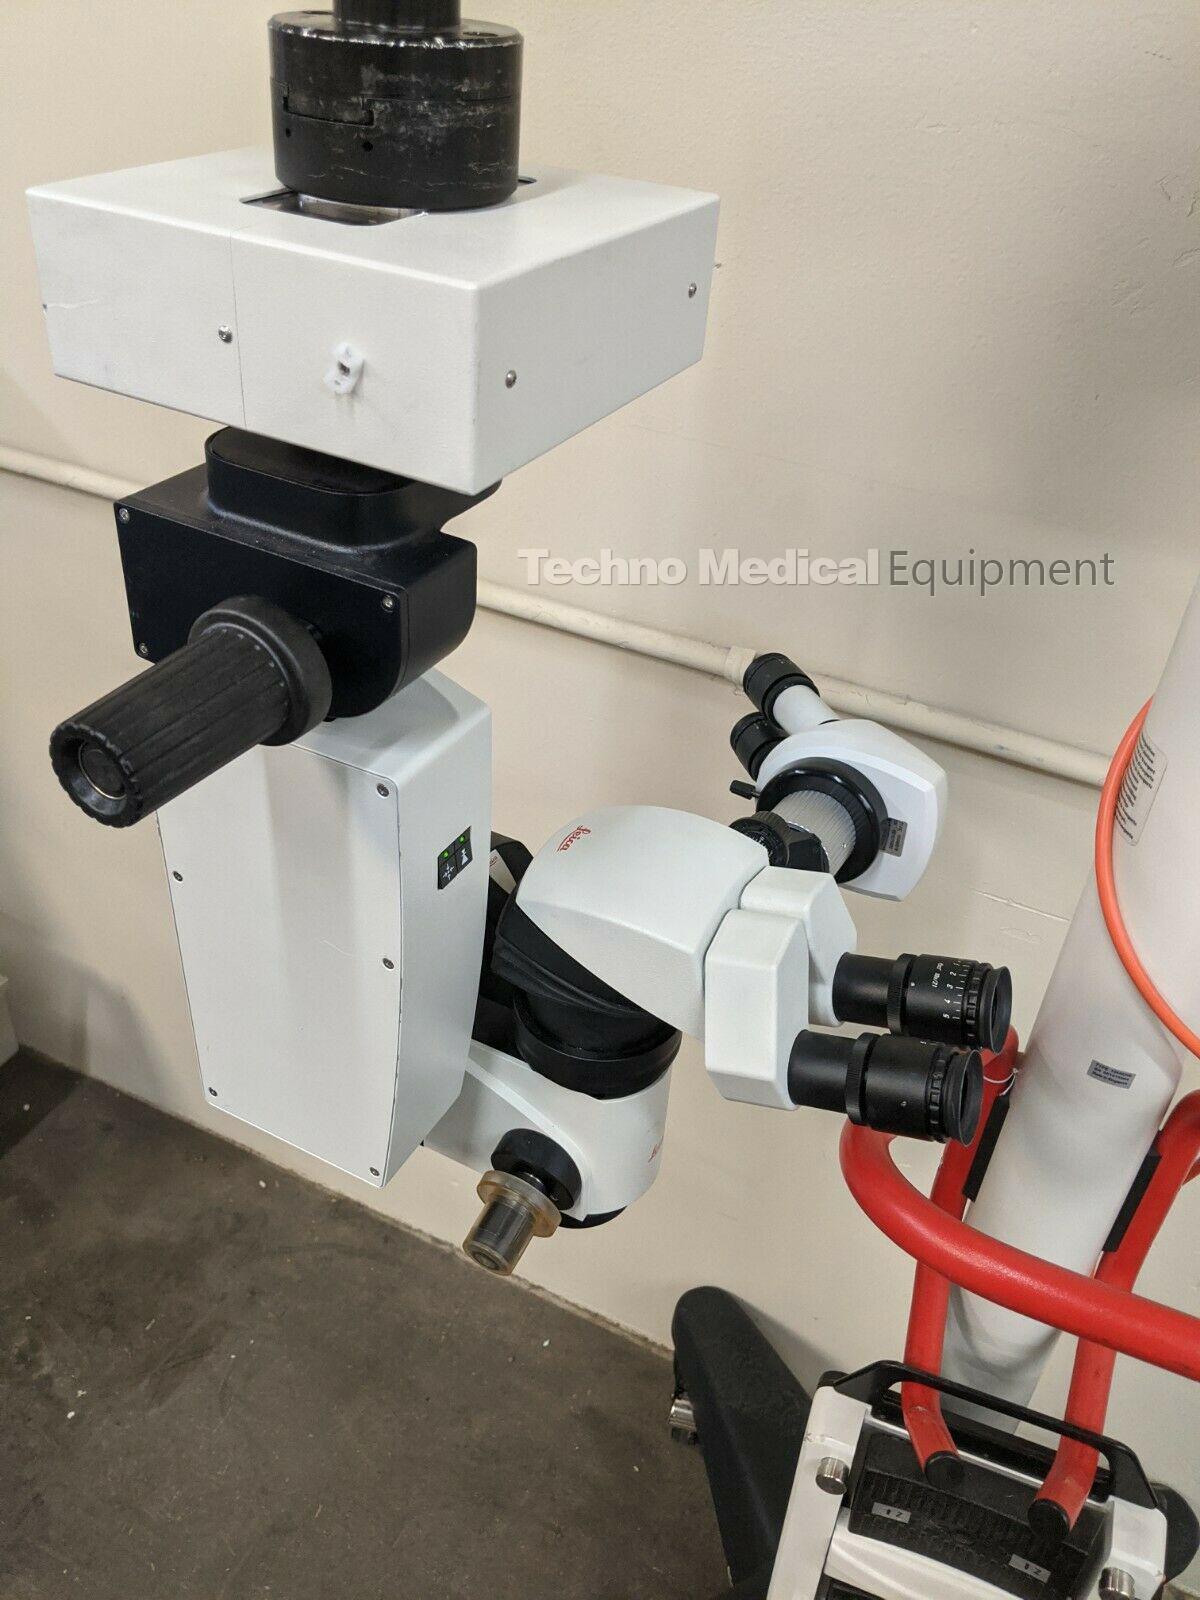 used-leica-m620-f20-surgical-microscope-price.jpg